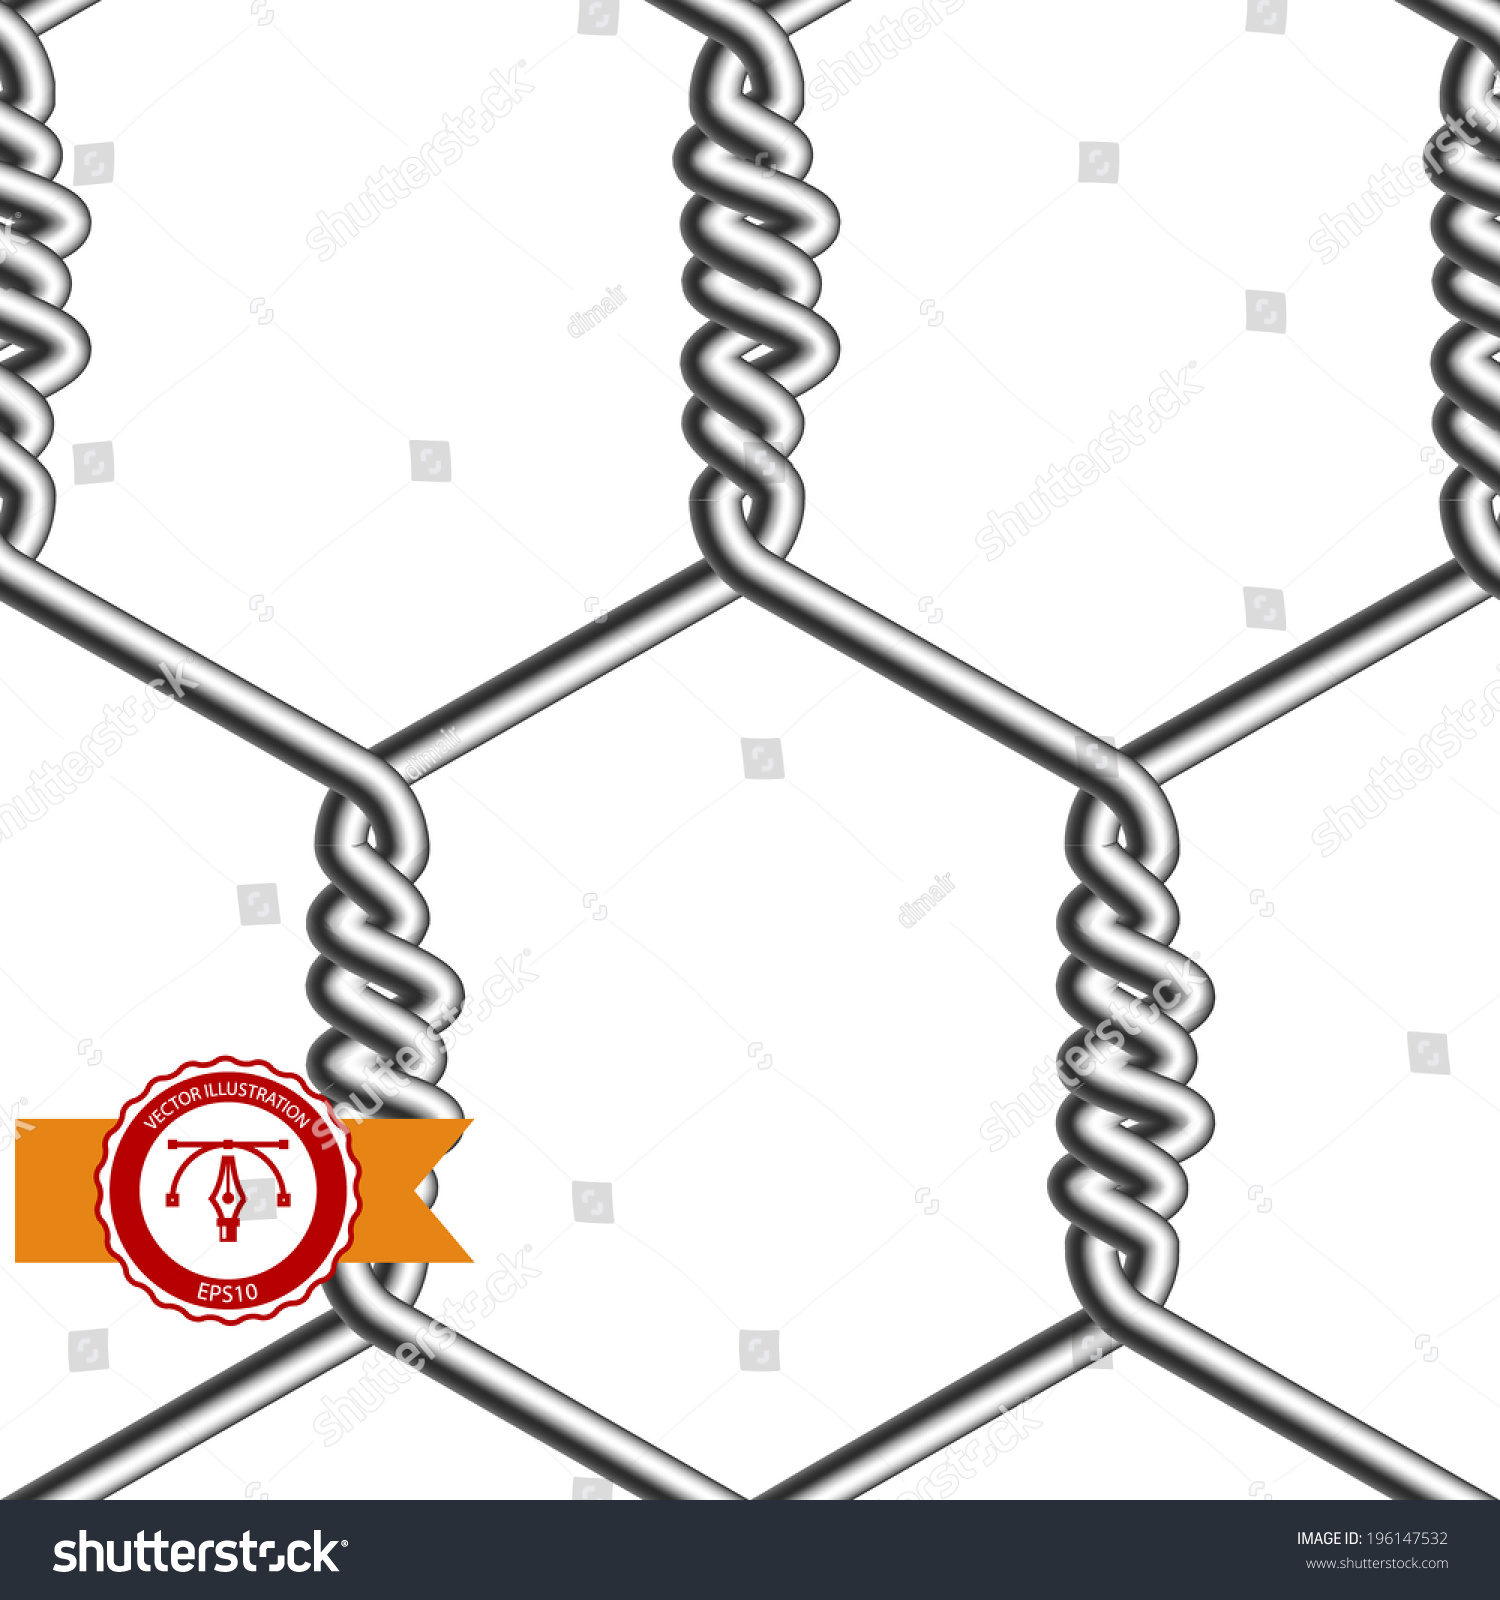 Seamless Chicken Wire Vector Stock Vector 196147532 - Shutterstock